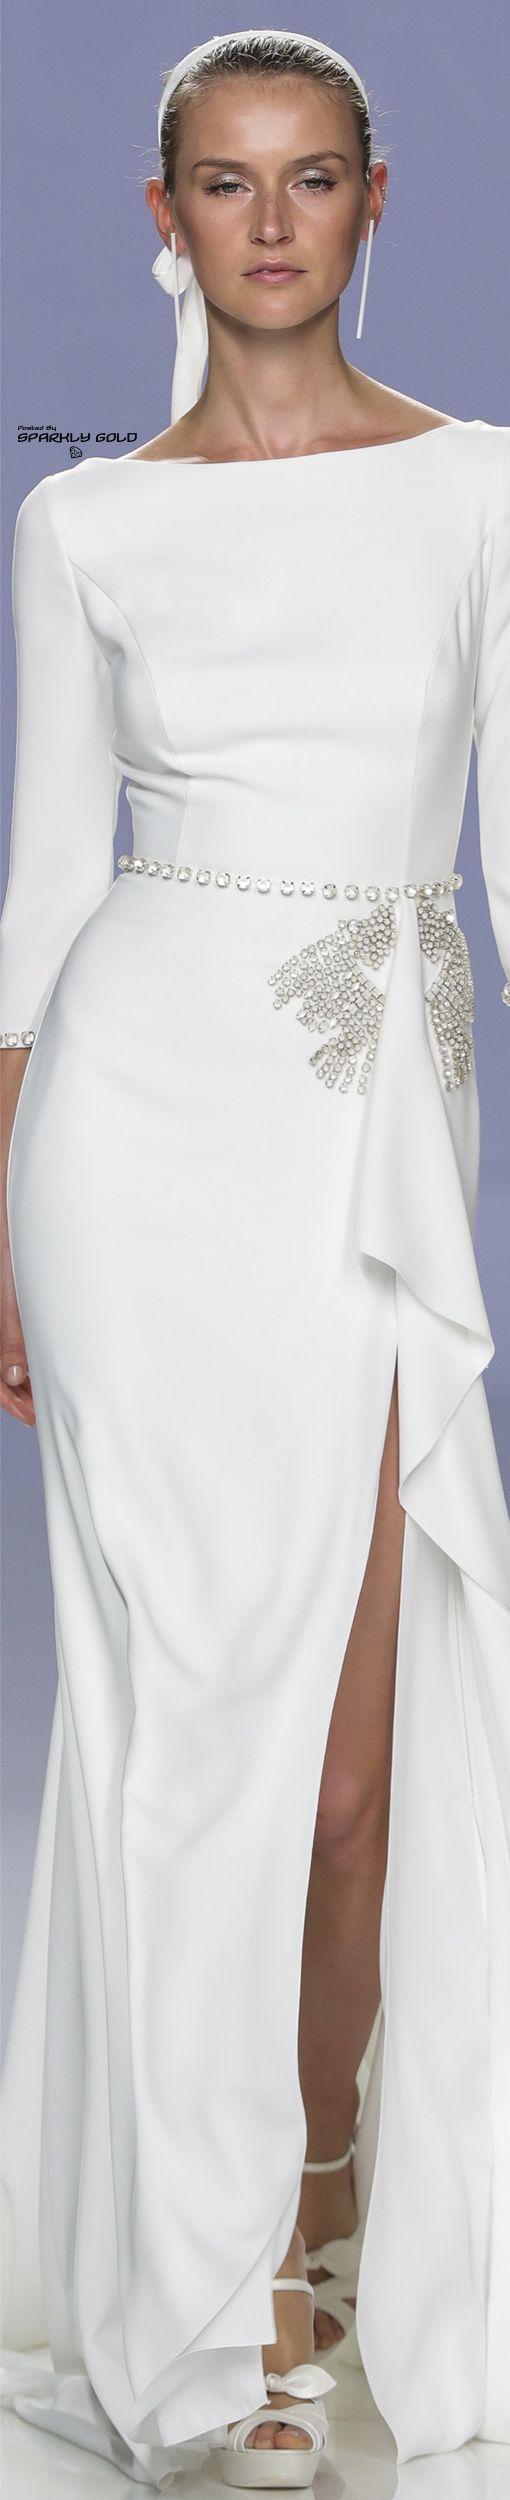 Rosa clará bridal spring wedding pinterest spring gowns